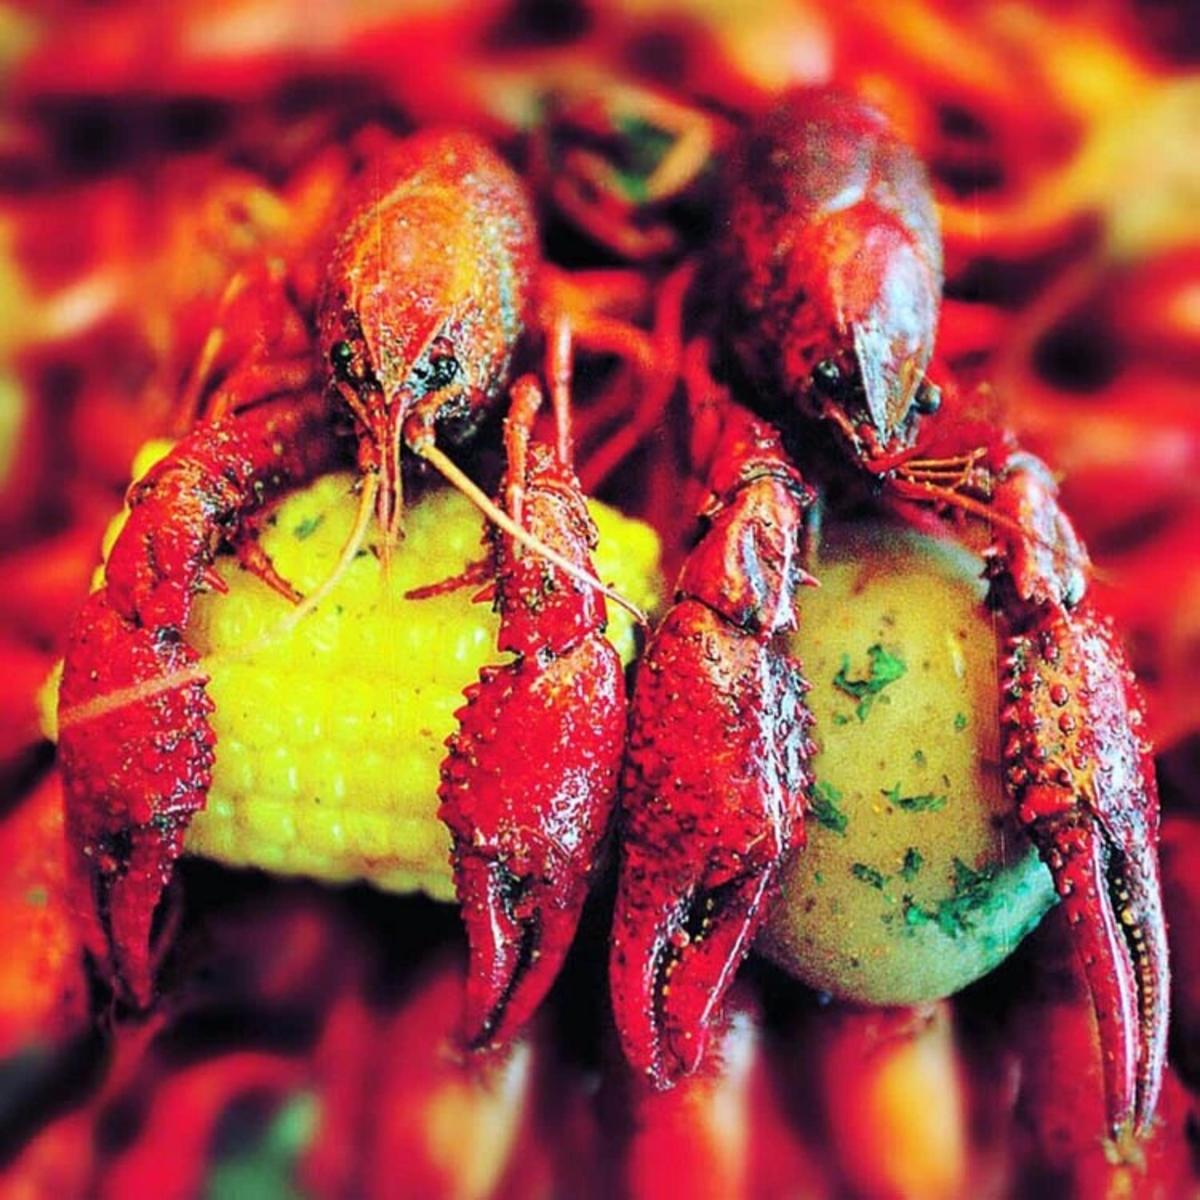 Crawfish from Crazy Cajun in Beaumont, TX